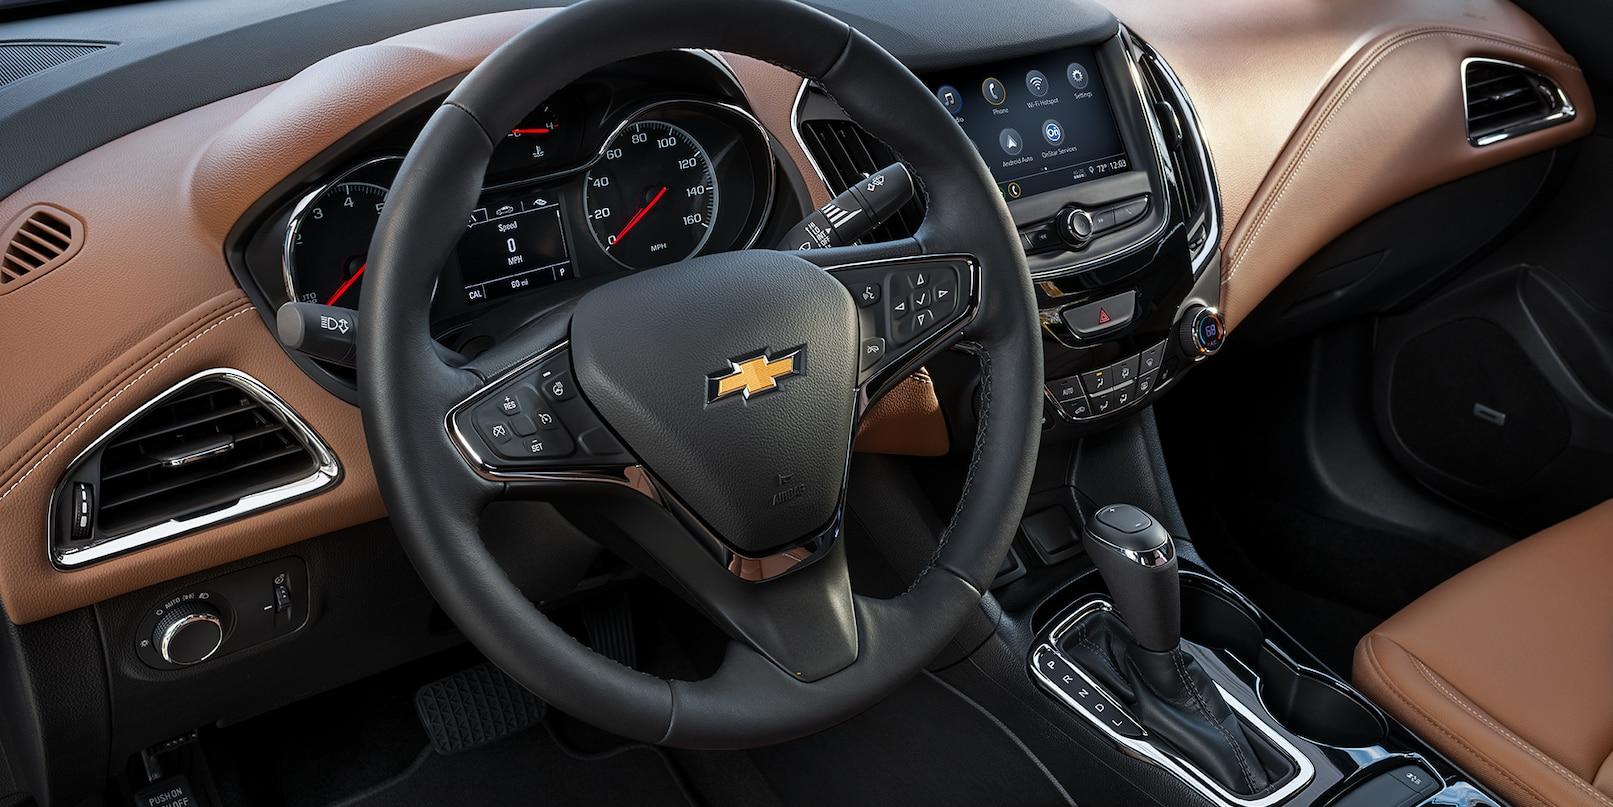 2019 Chevrolet Cruze Steering Wheel